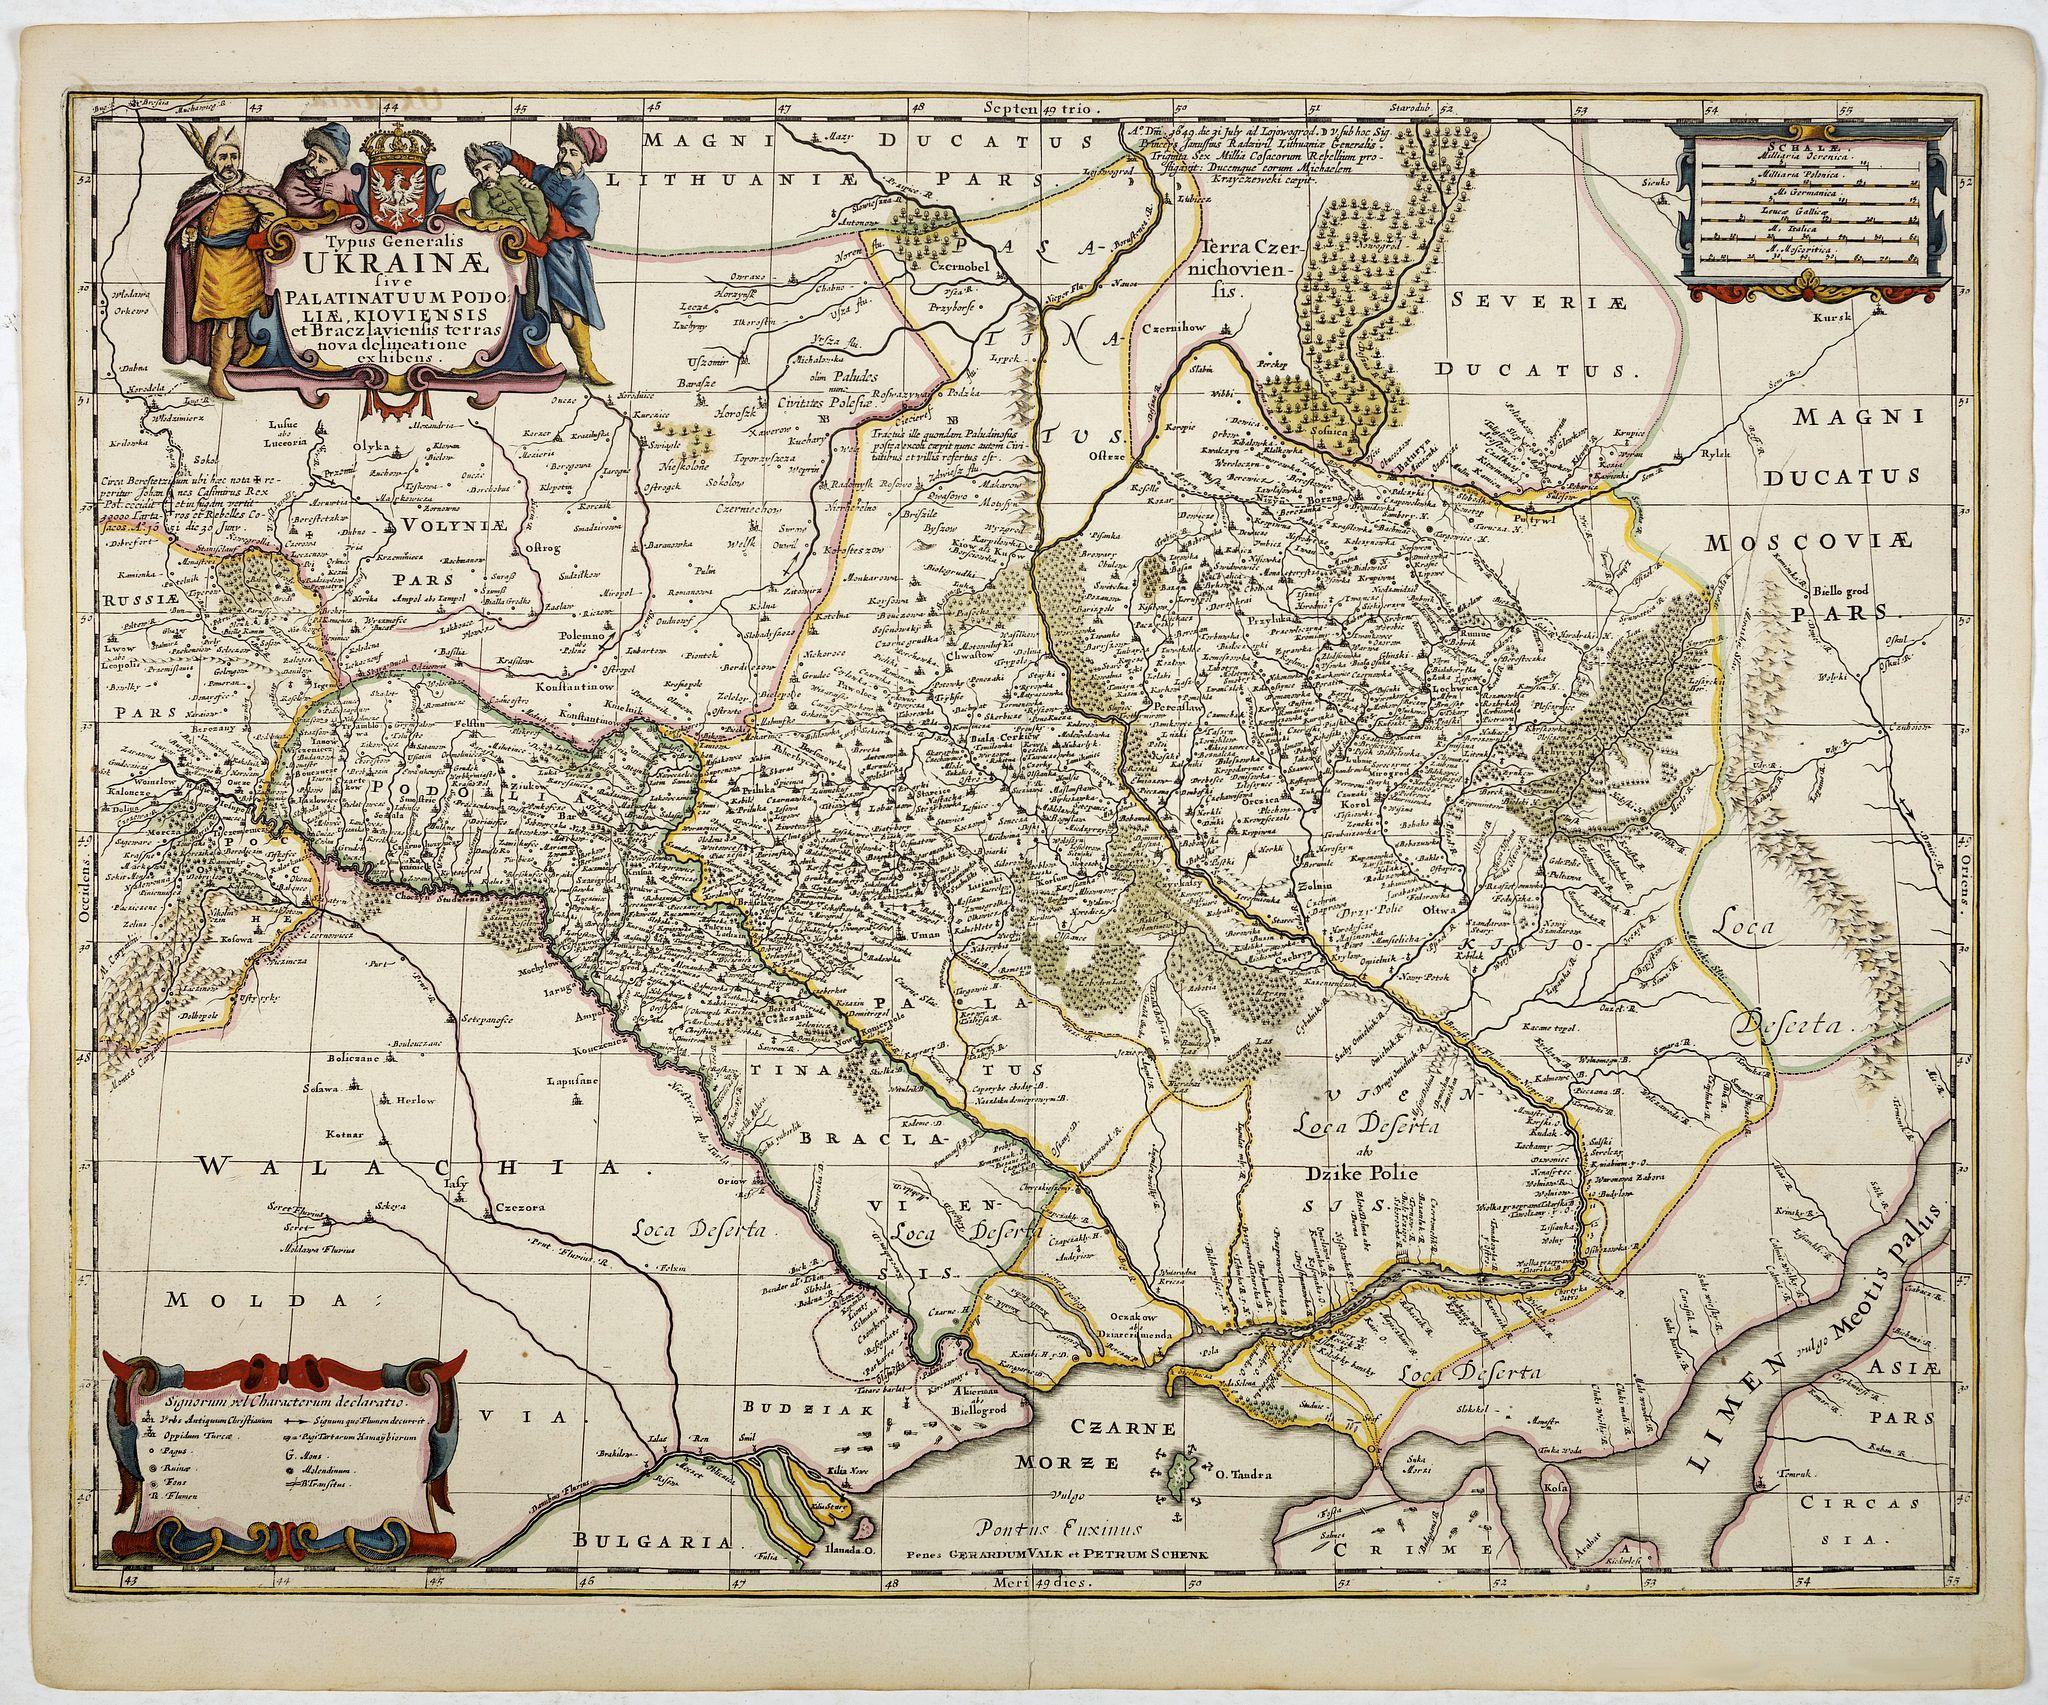 JANSSONIUS VAN WAESBERGHE -  Typus Generalis Ukrainae sive Palatinatuum Podoliae, Kioviensis et Braczlaviensis terras nova delineatione exhibens. . .